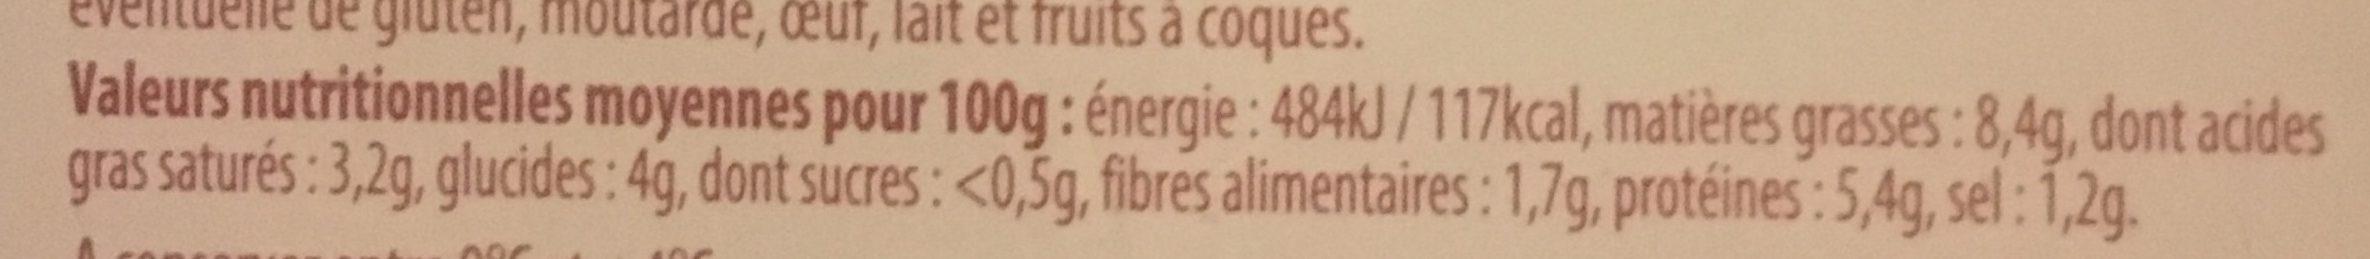 Choucroute - Nutrition facts